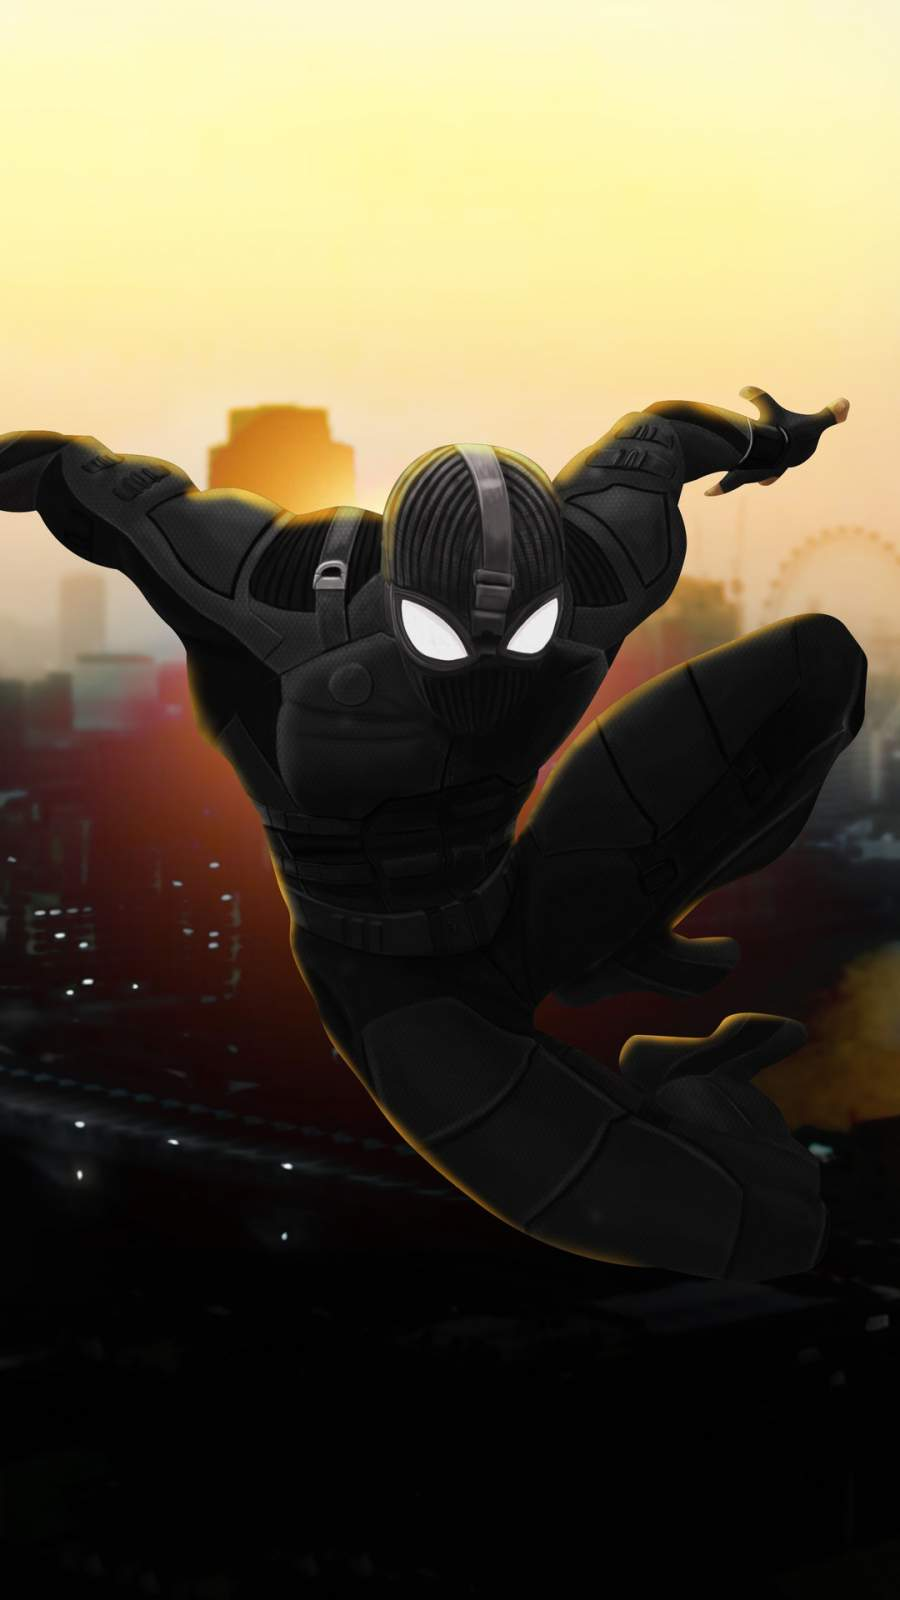 Spiderman Night Monkey iPhone Wallpaper